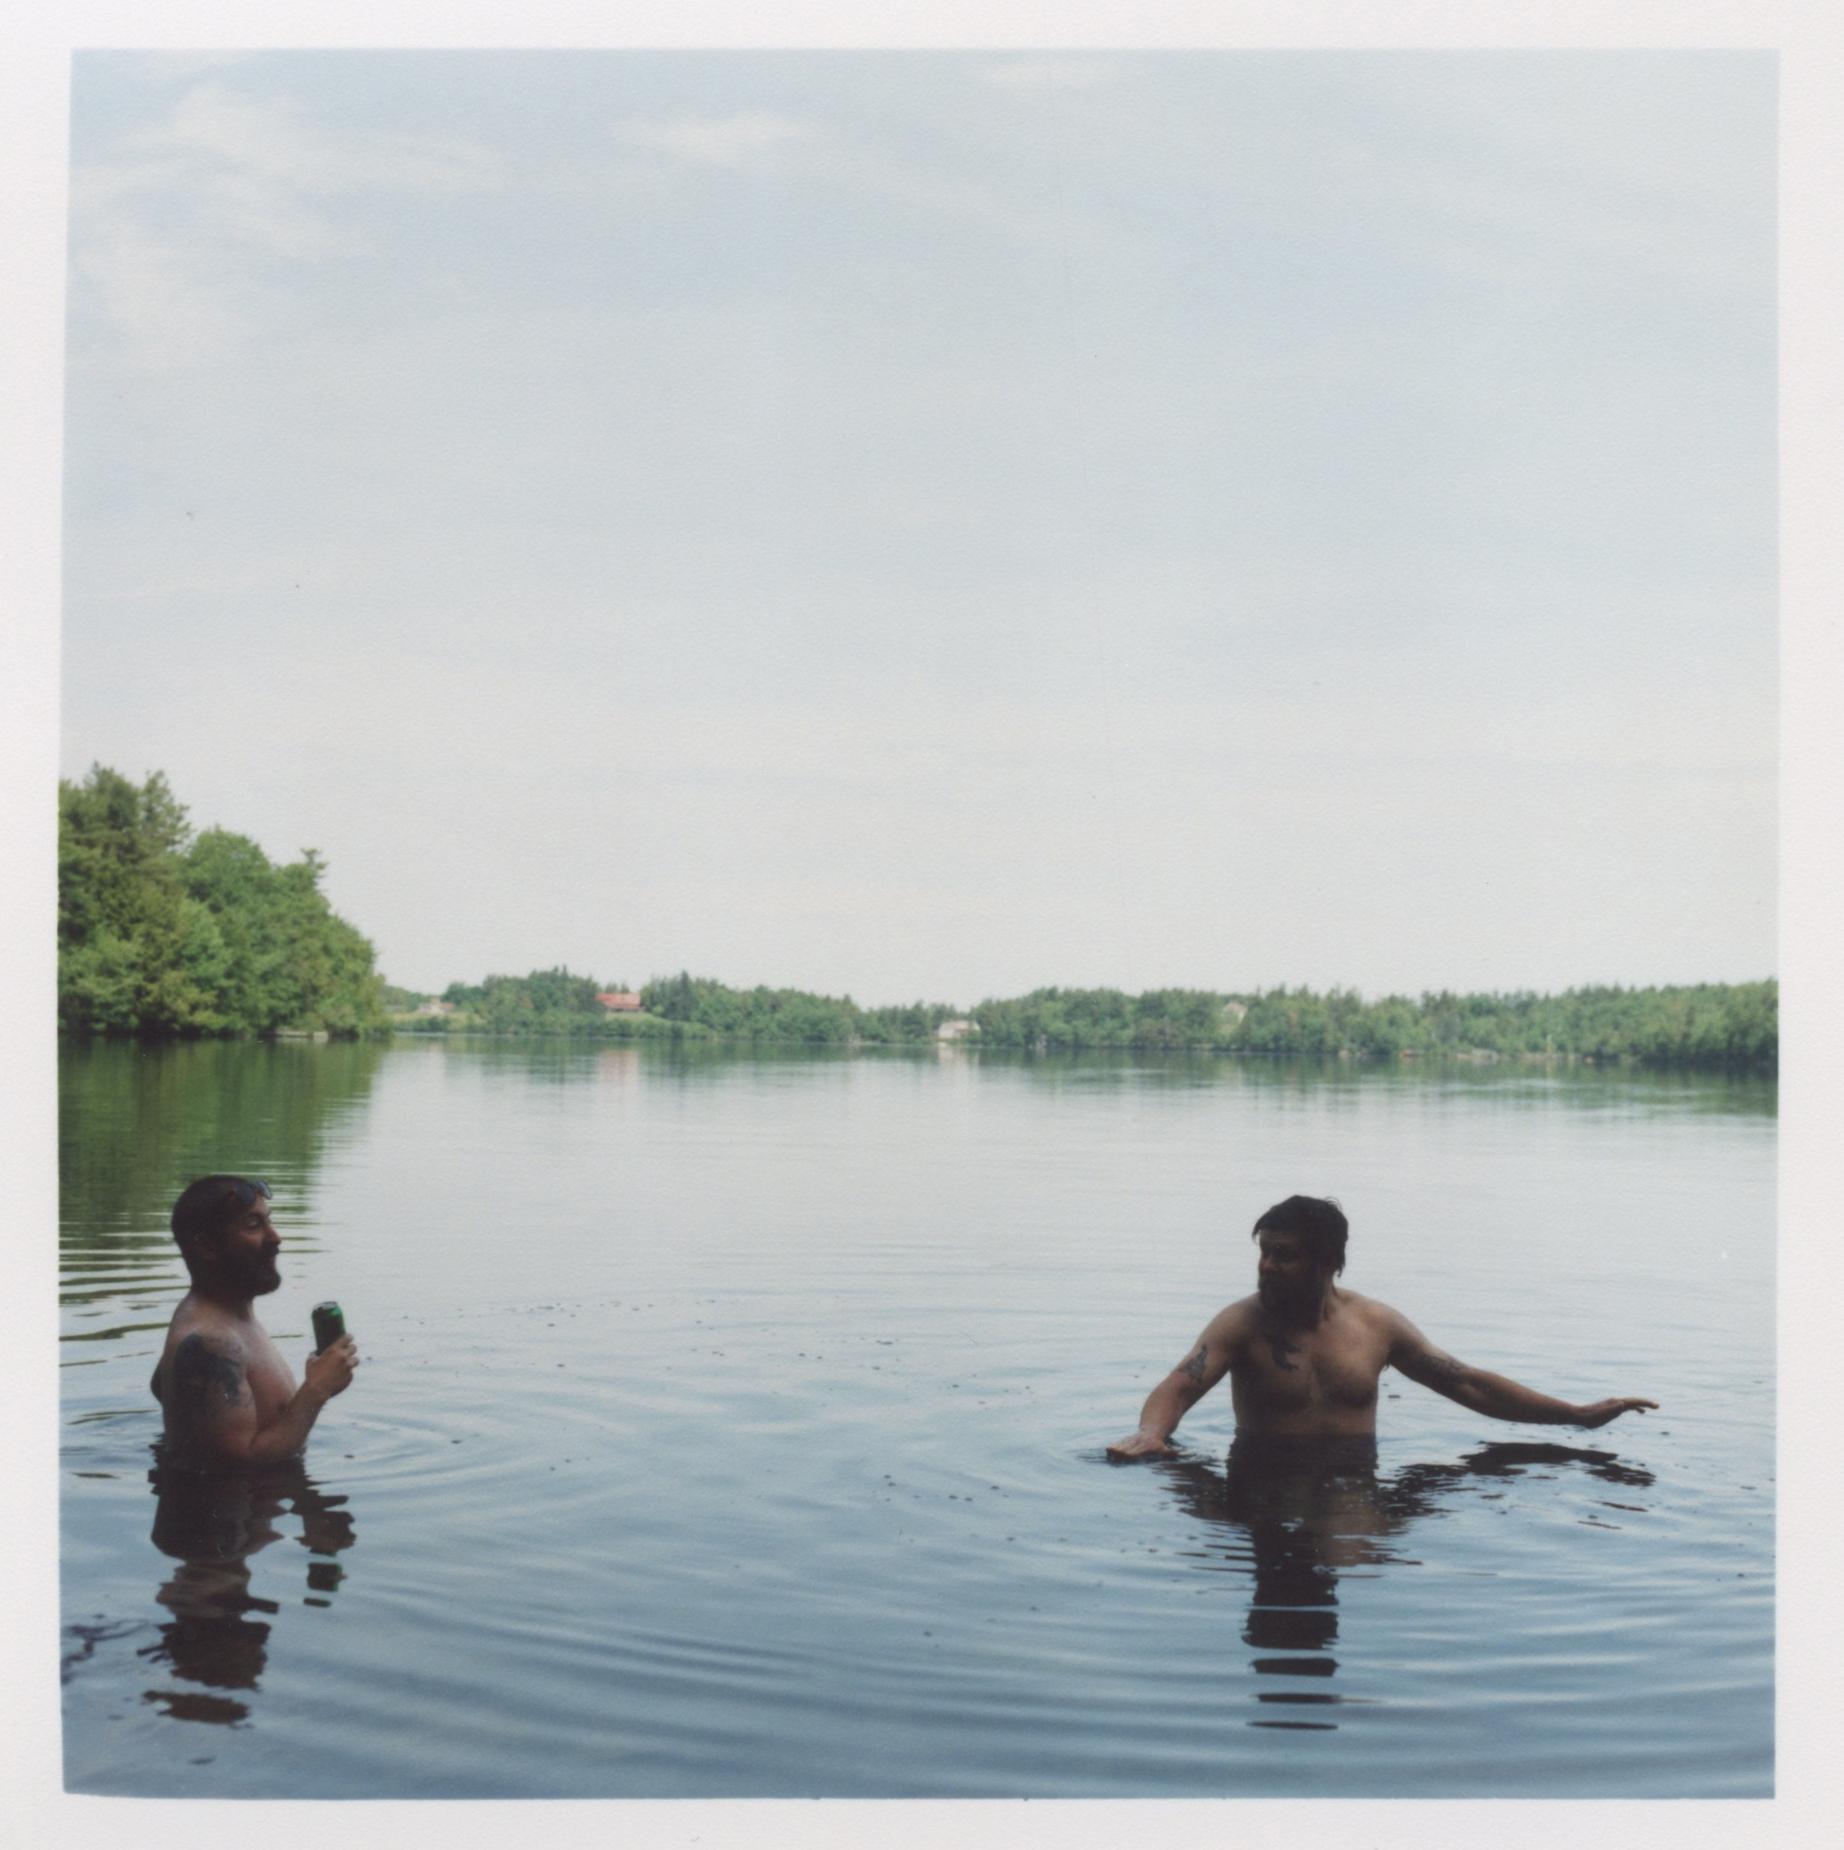 Eric & Nick